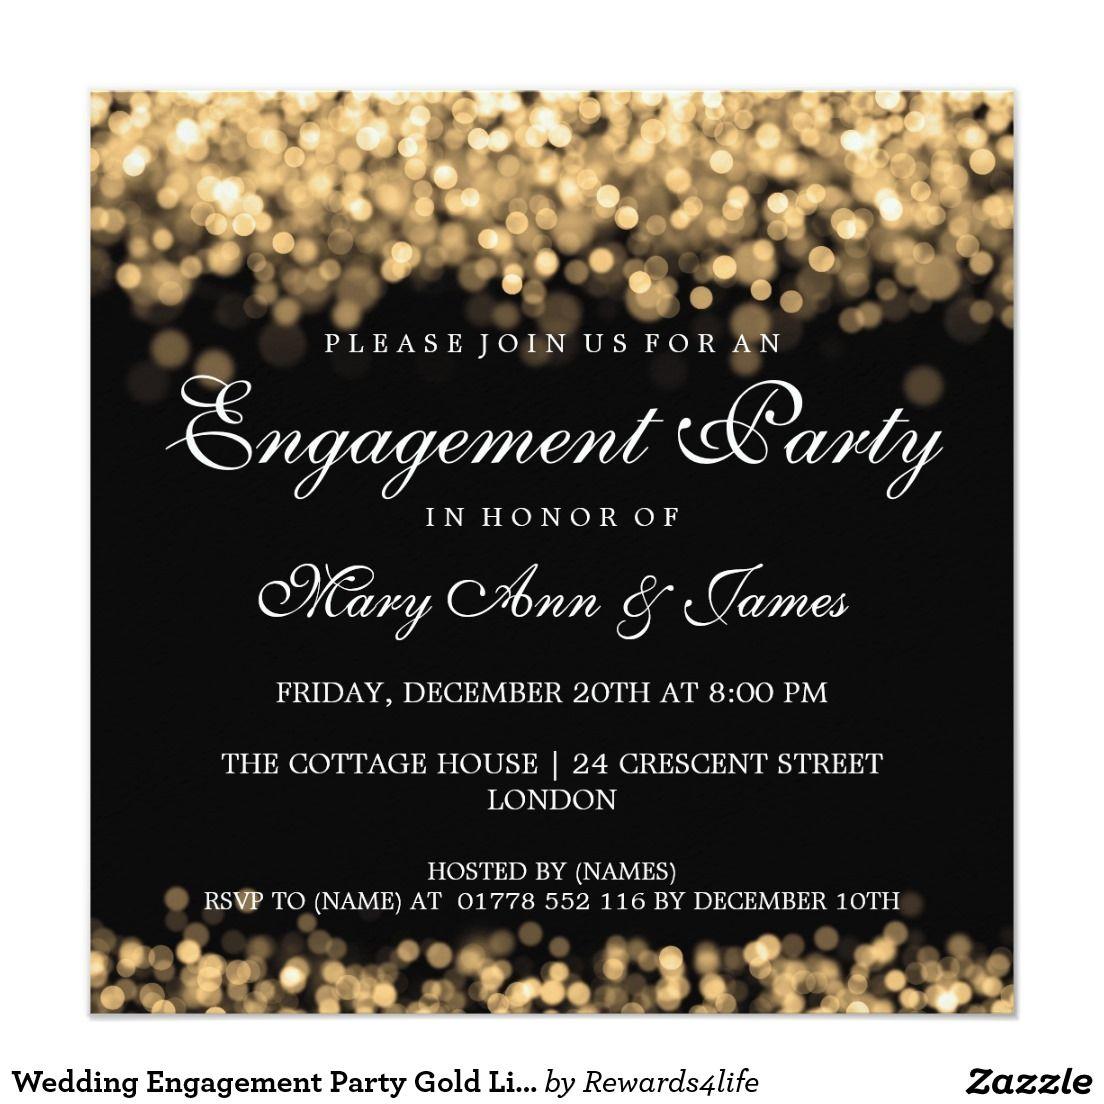 Engagement invitations | Engagements, Wedding and Wedding